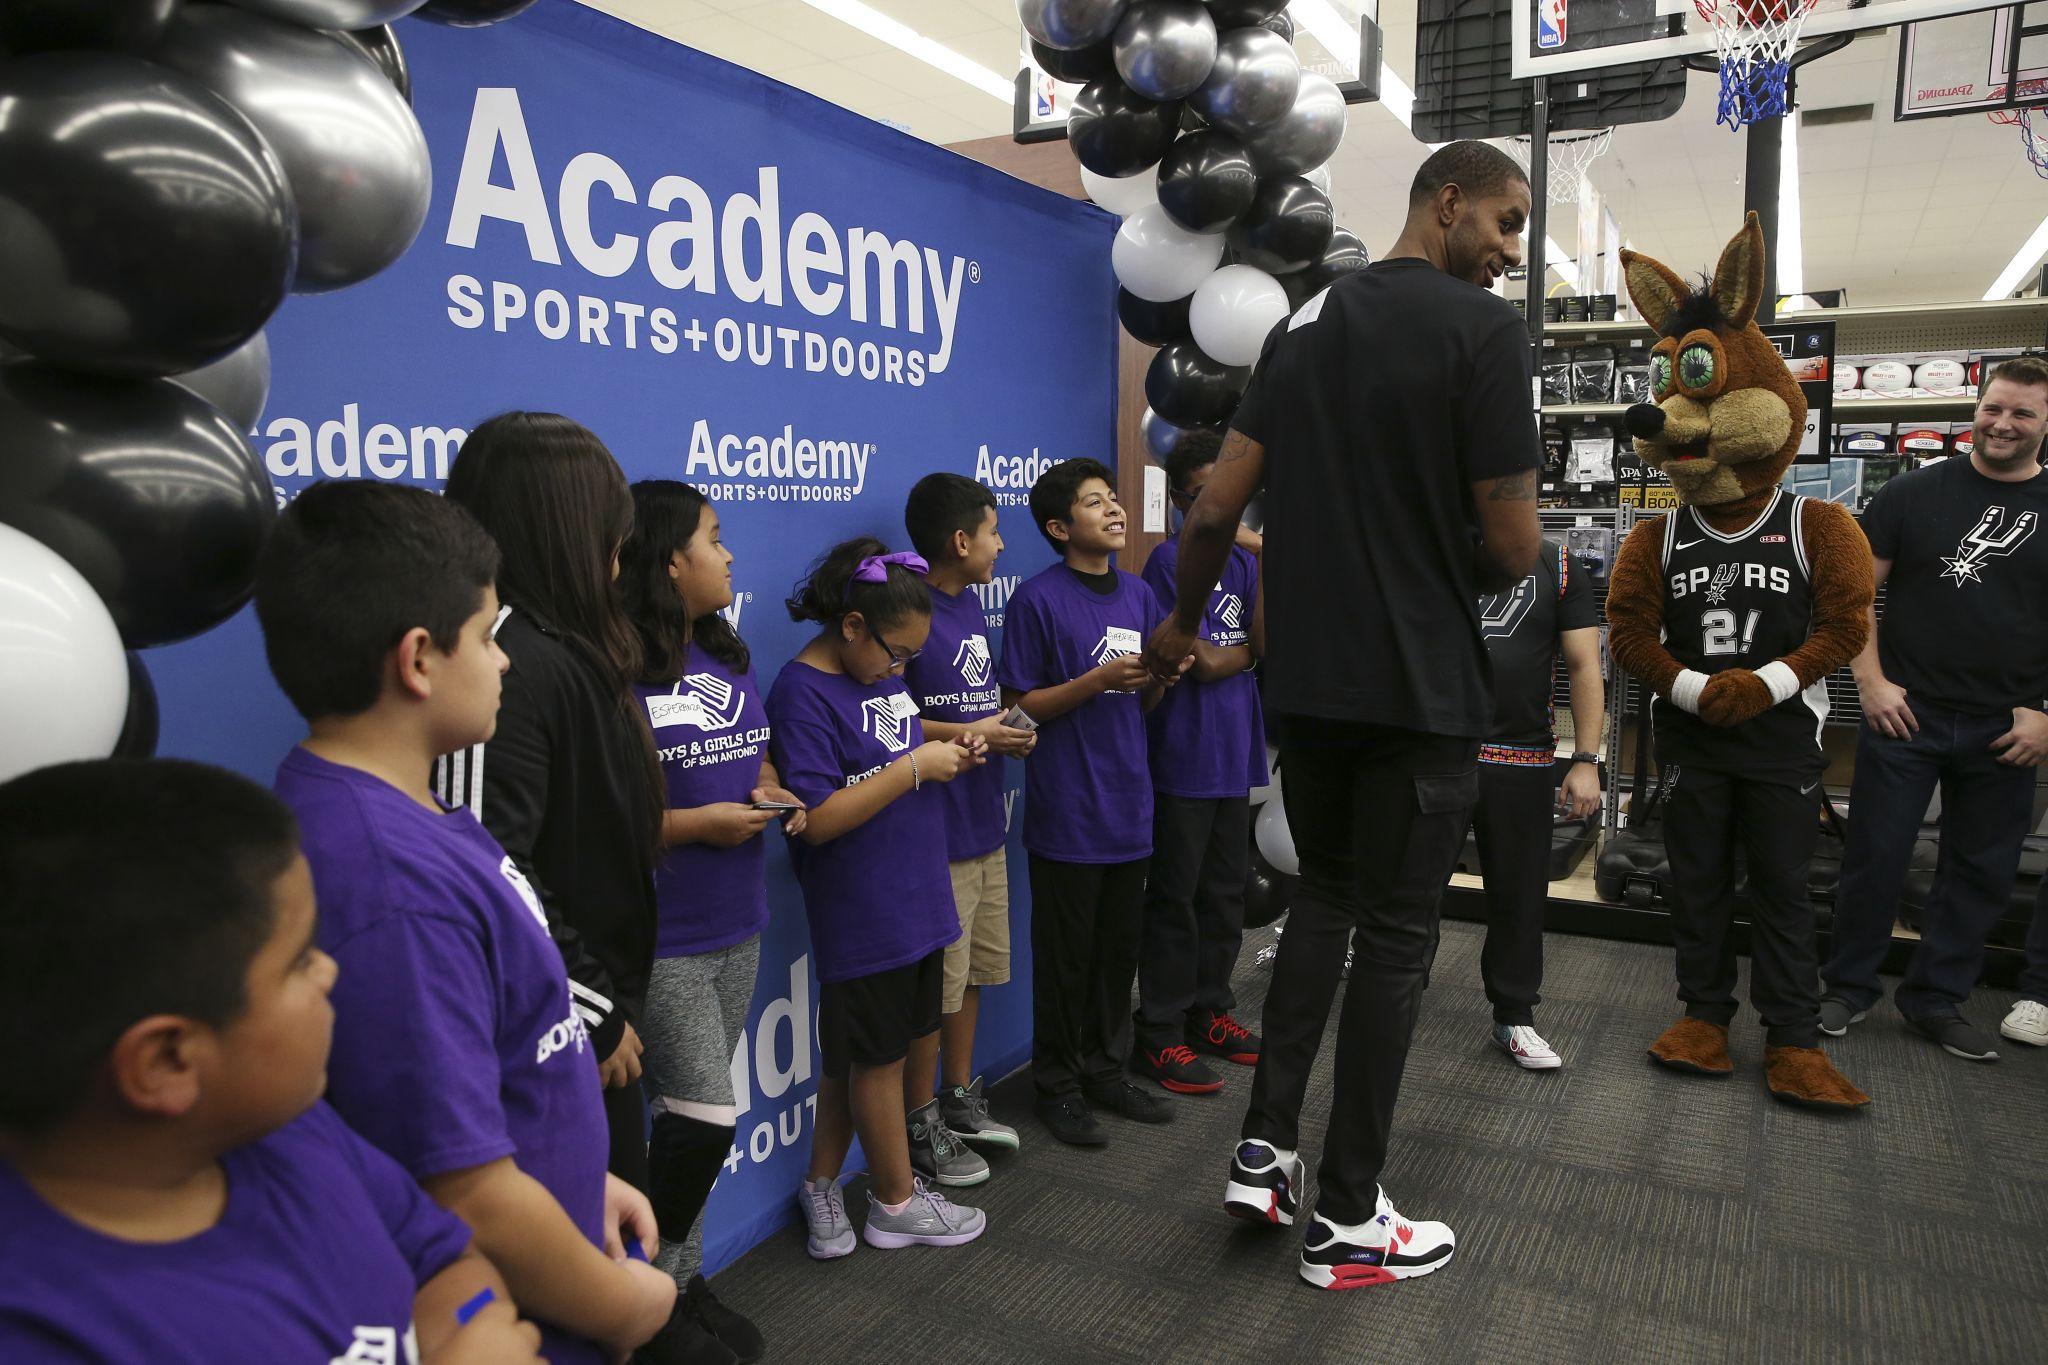 Spurs LaMarcus Aldridge surprises students at the Academy Sports + Outdoors